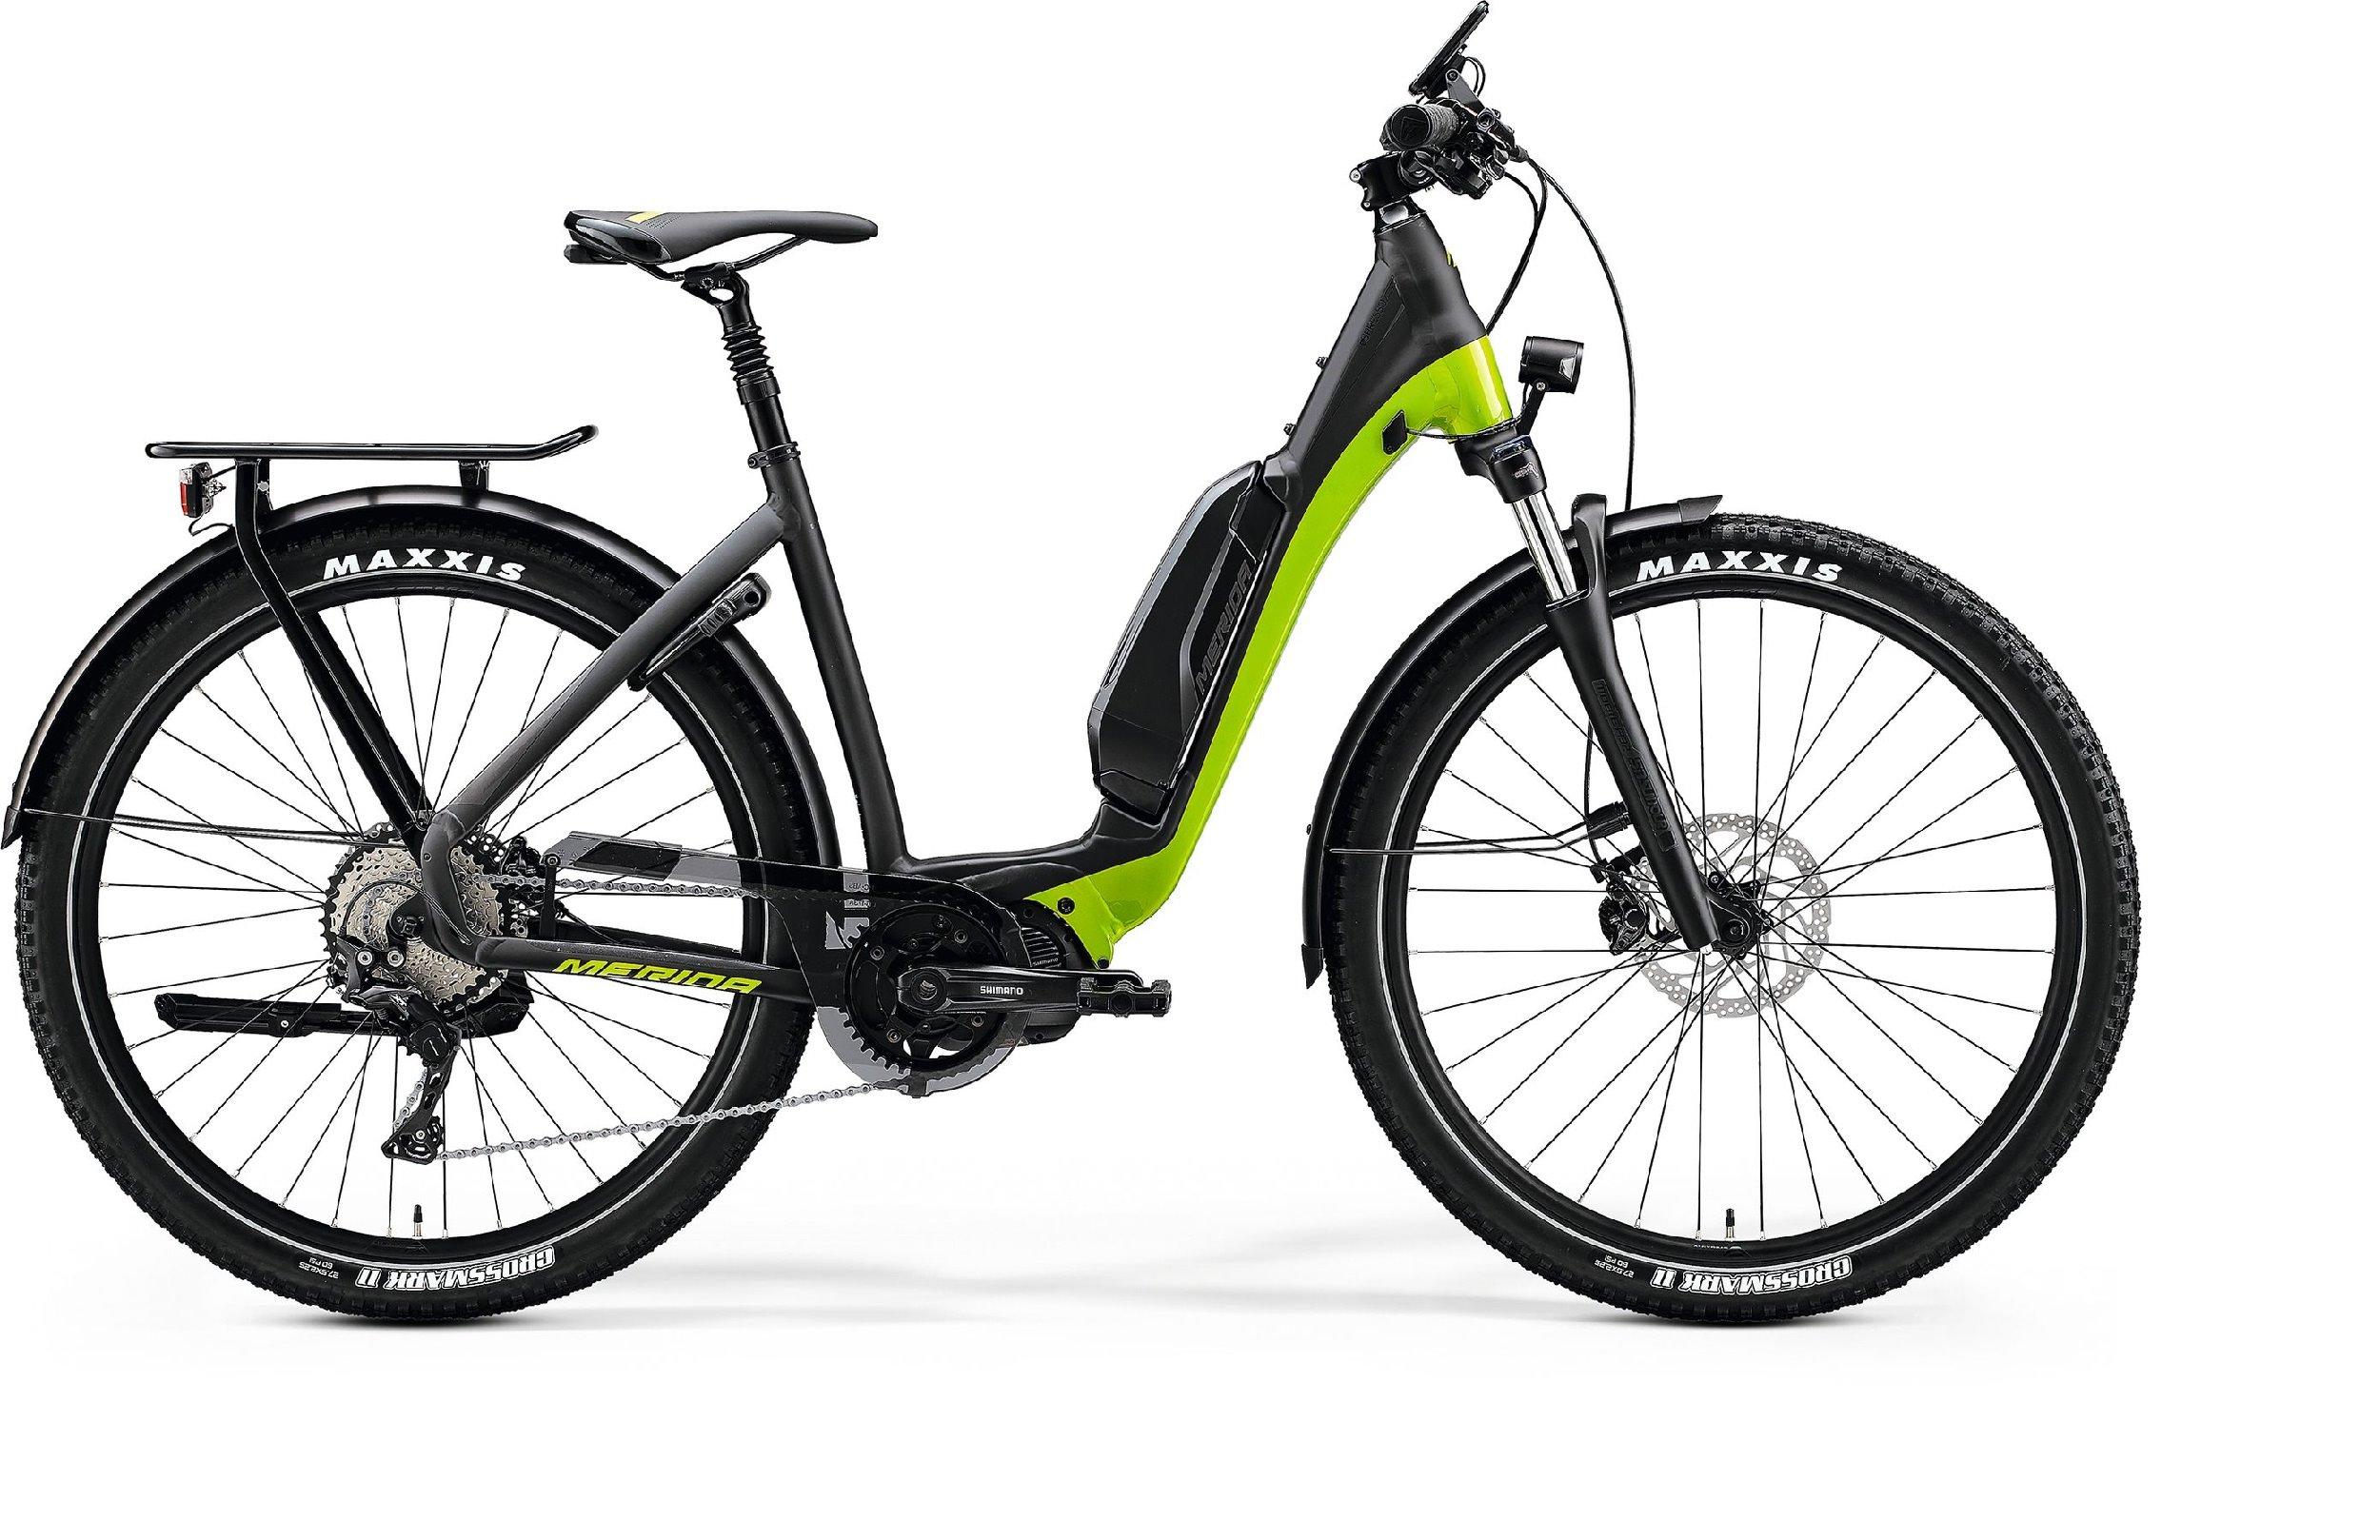 Merida eSPRESSO CC XT-EDITION EQ černé/zelené 155-165cm